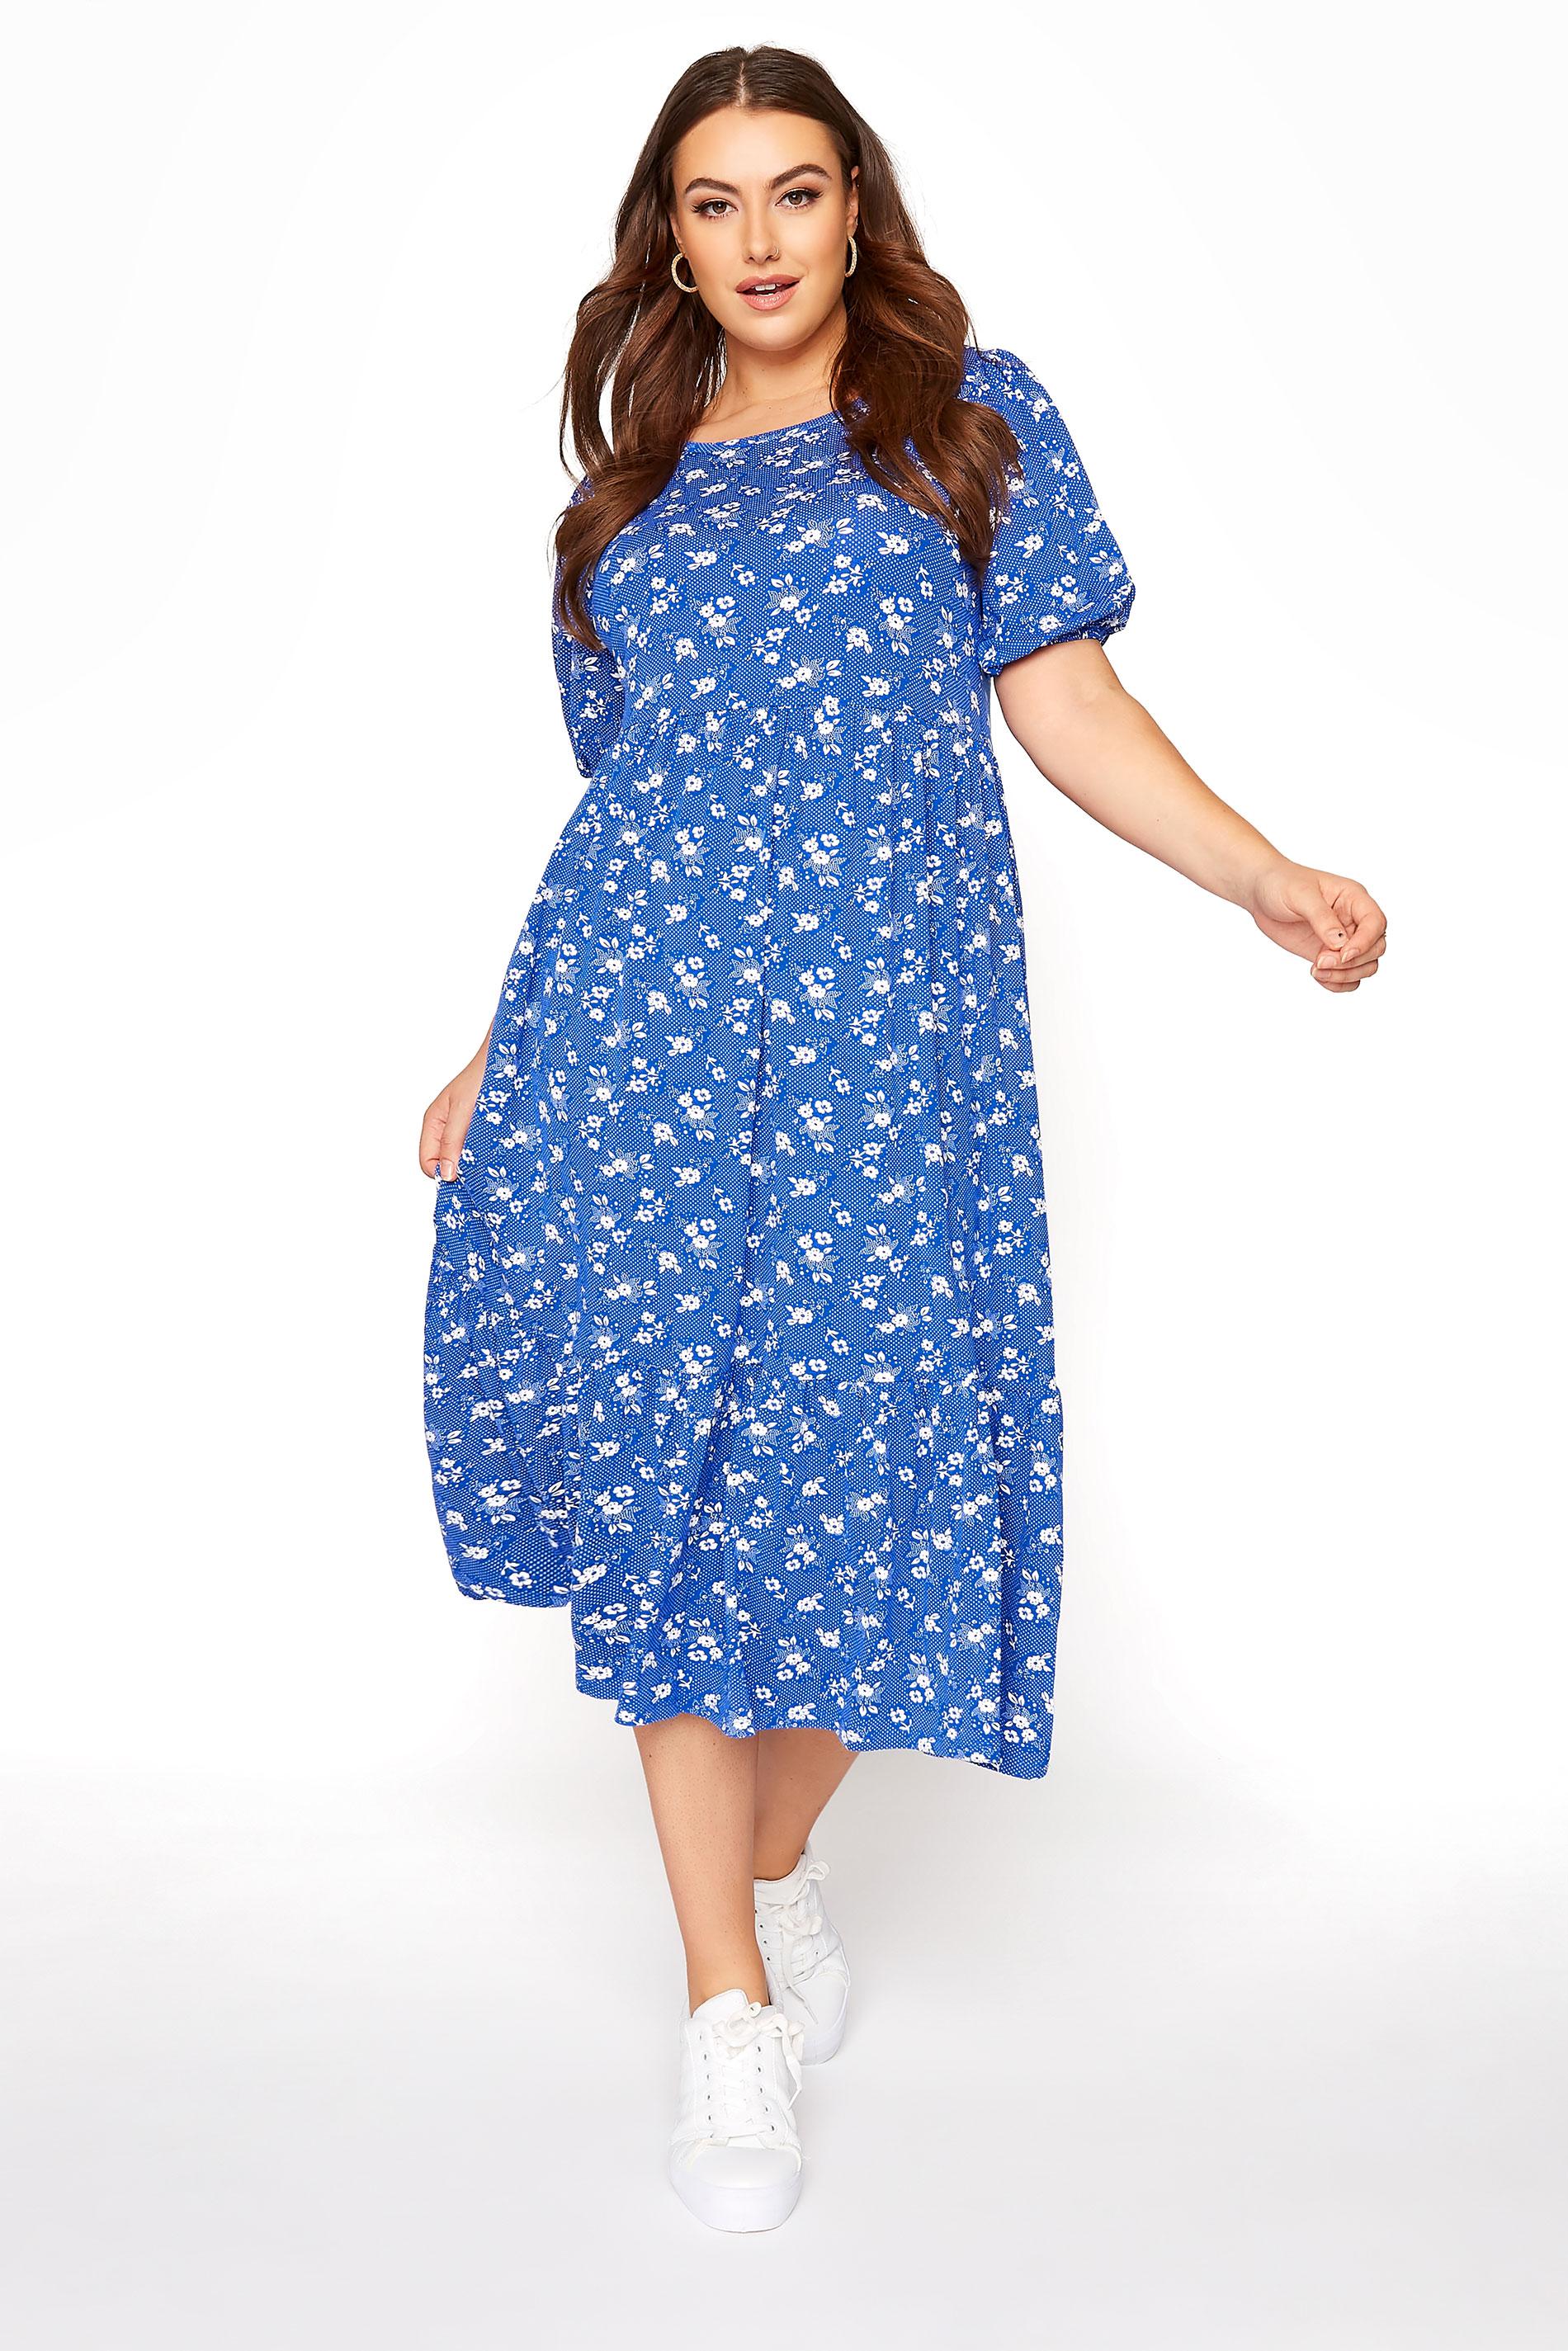 Blue Floral Puff Sleeve Midaxi Dress_A.jpg